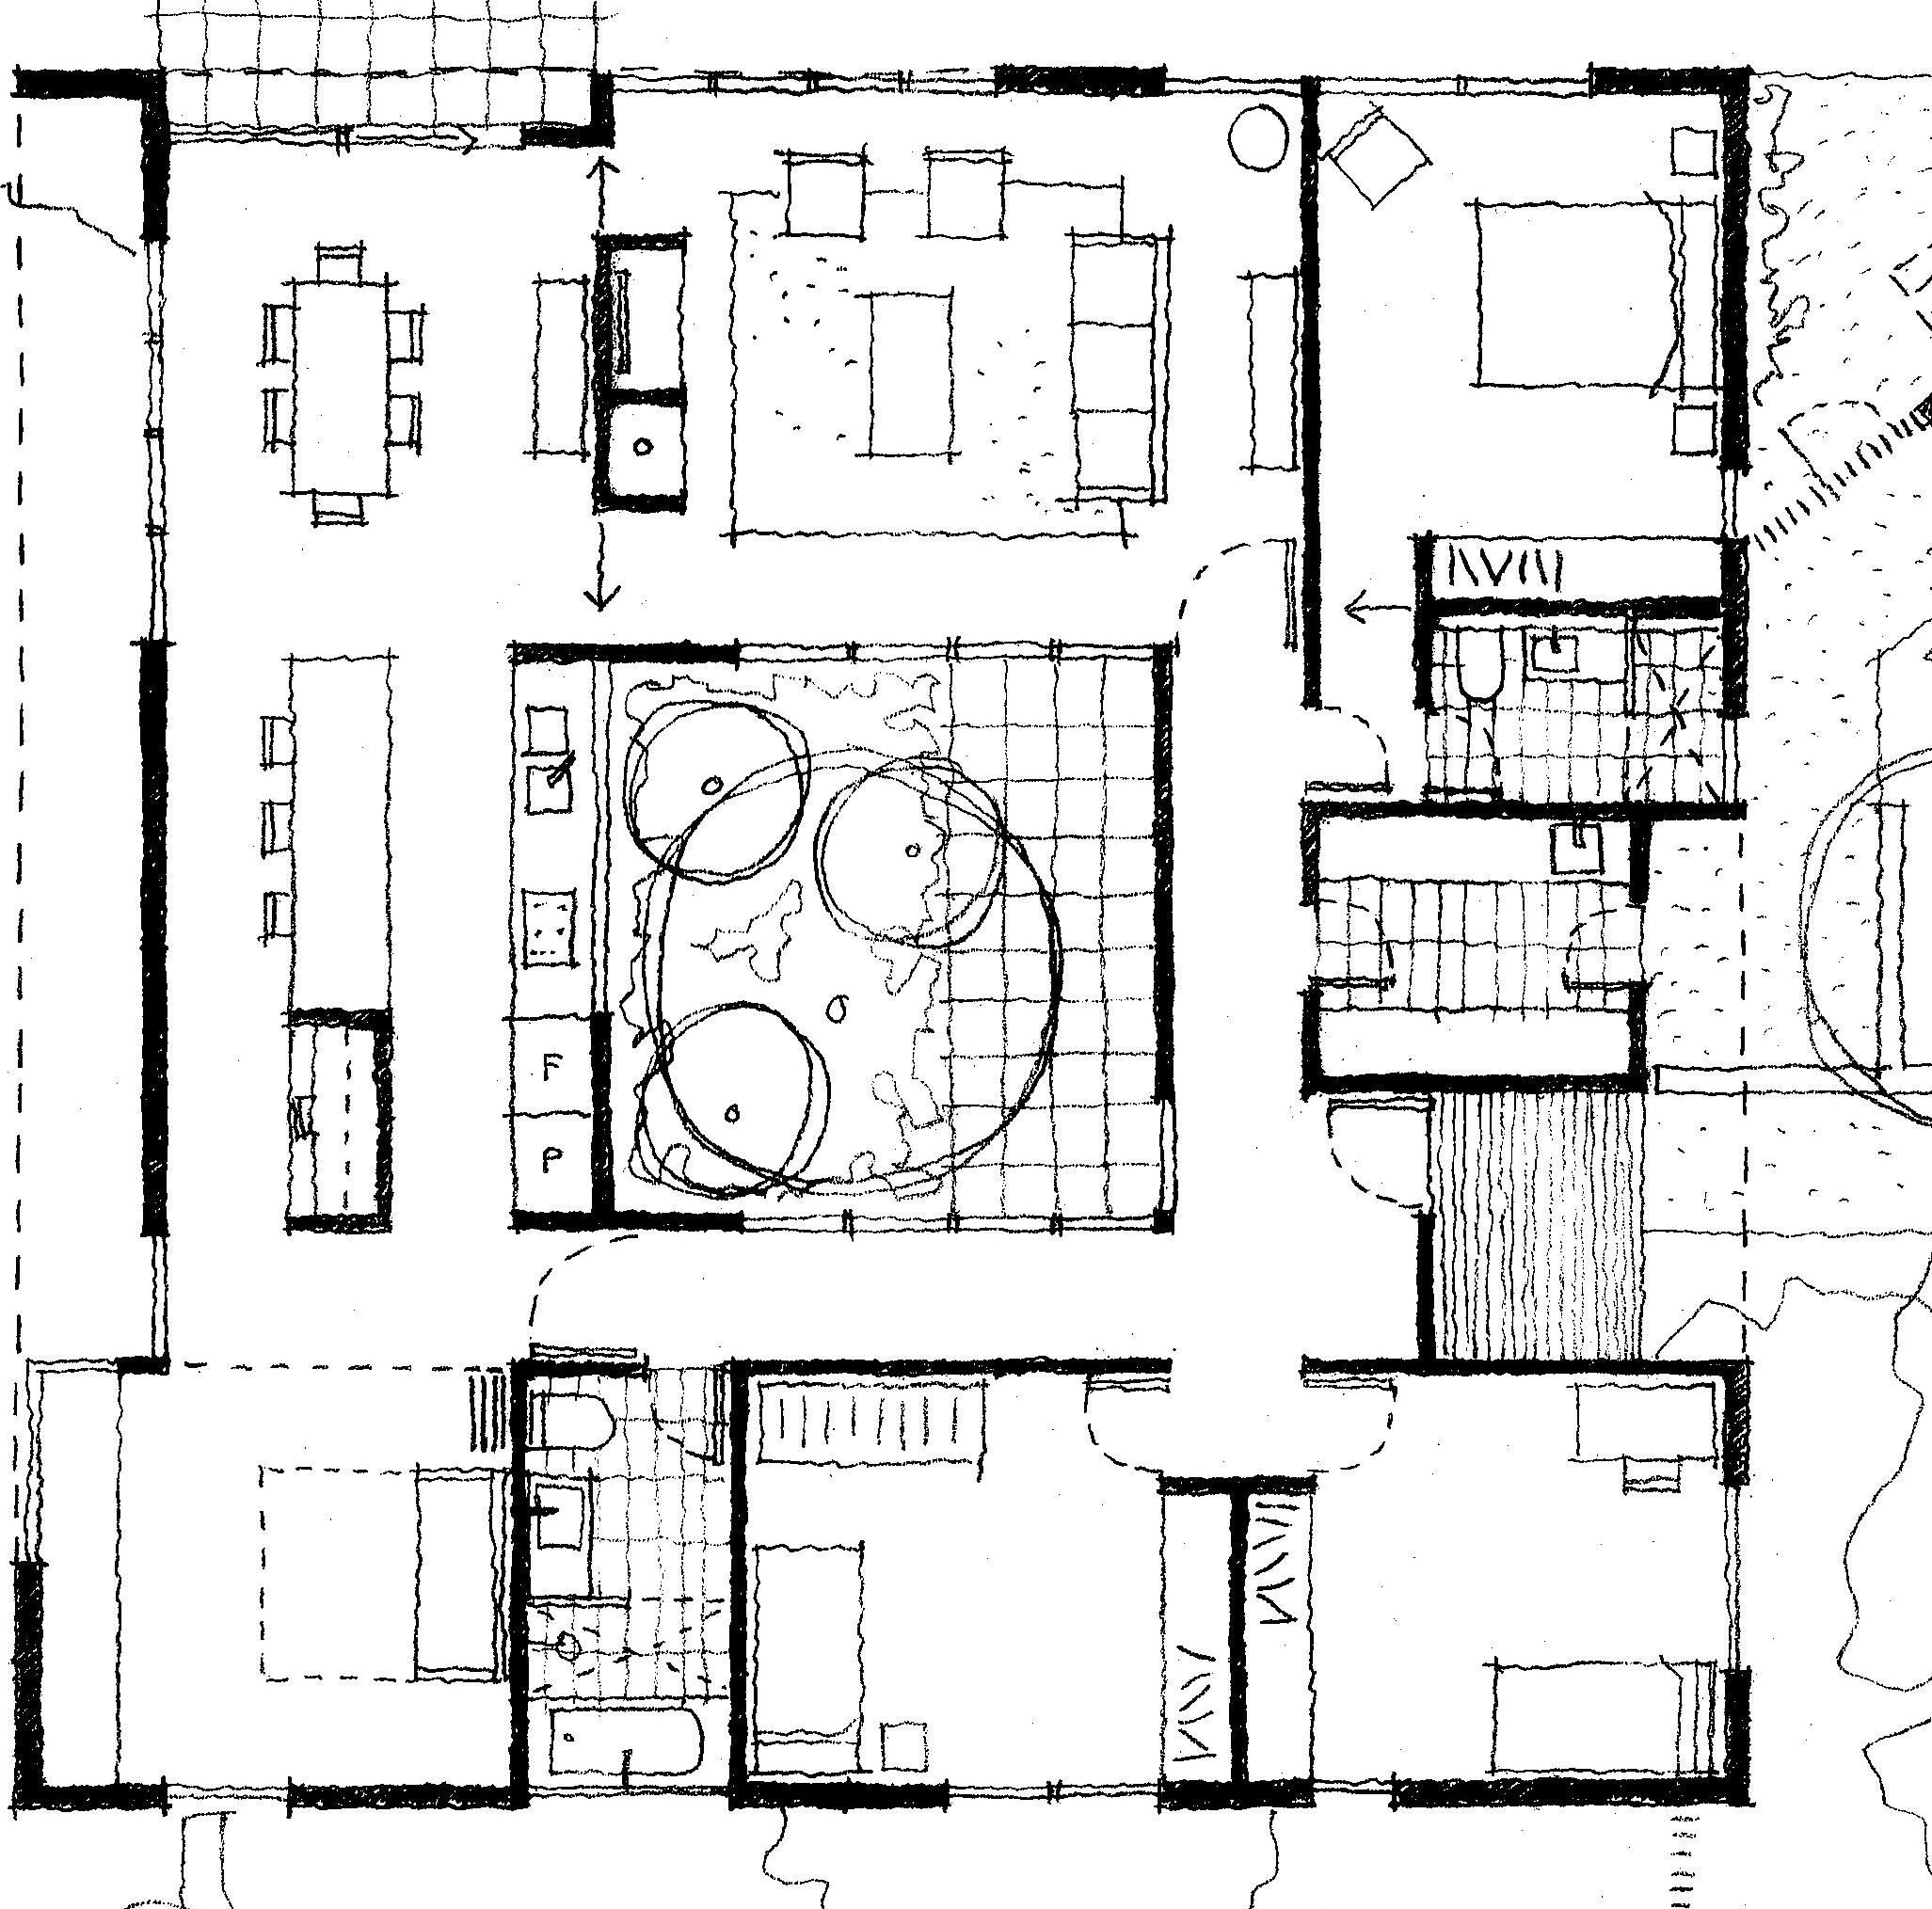 Concept Design Sketch.jpg